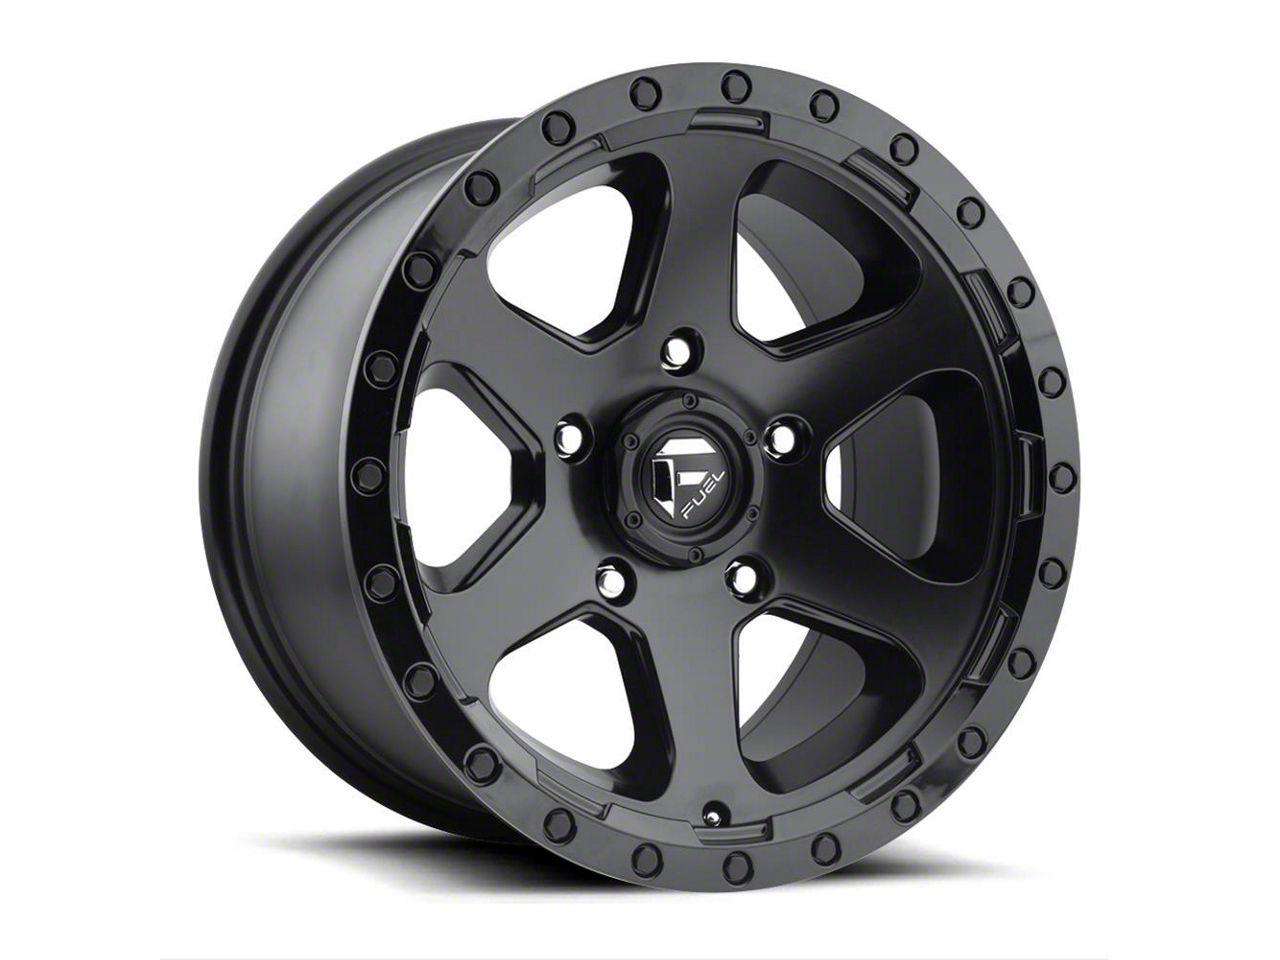 Fuel Wheels Ripper Matte Black 5-Lug Wheel - 18x9 (02-18 RAM 1500, Excluding Mega Cab)